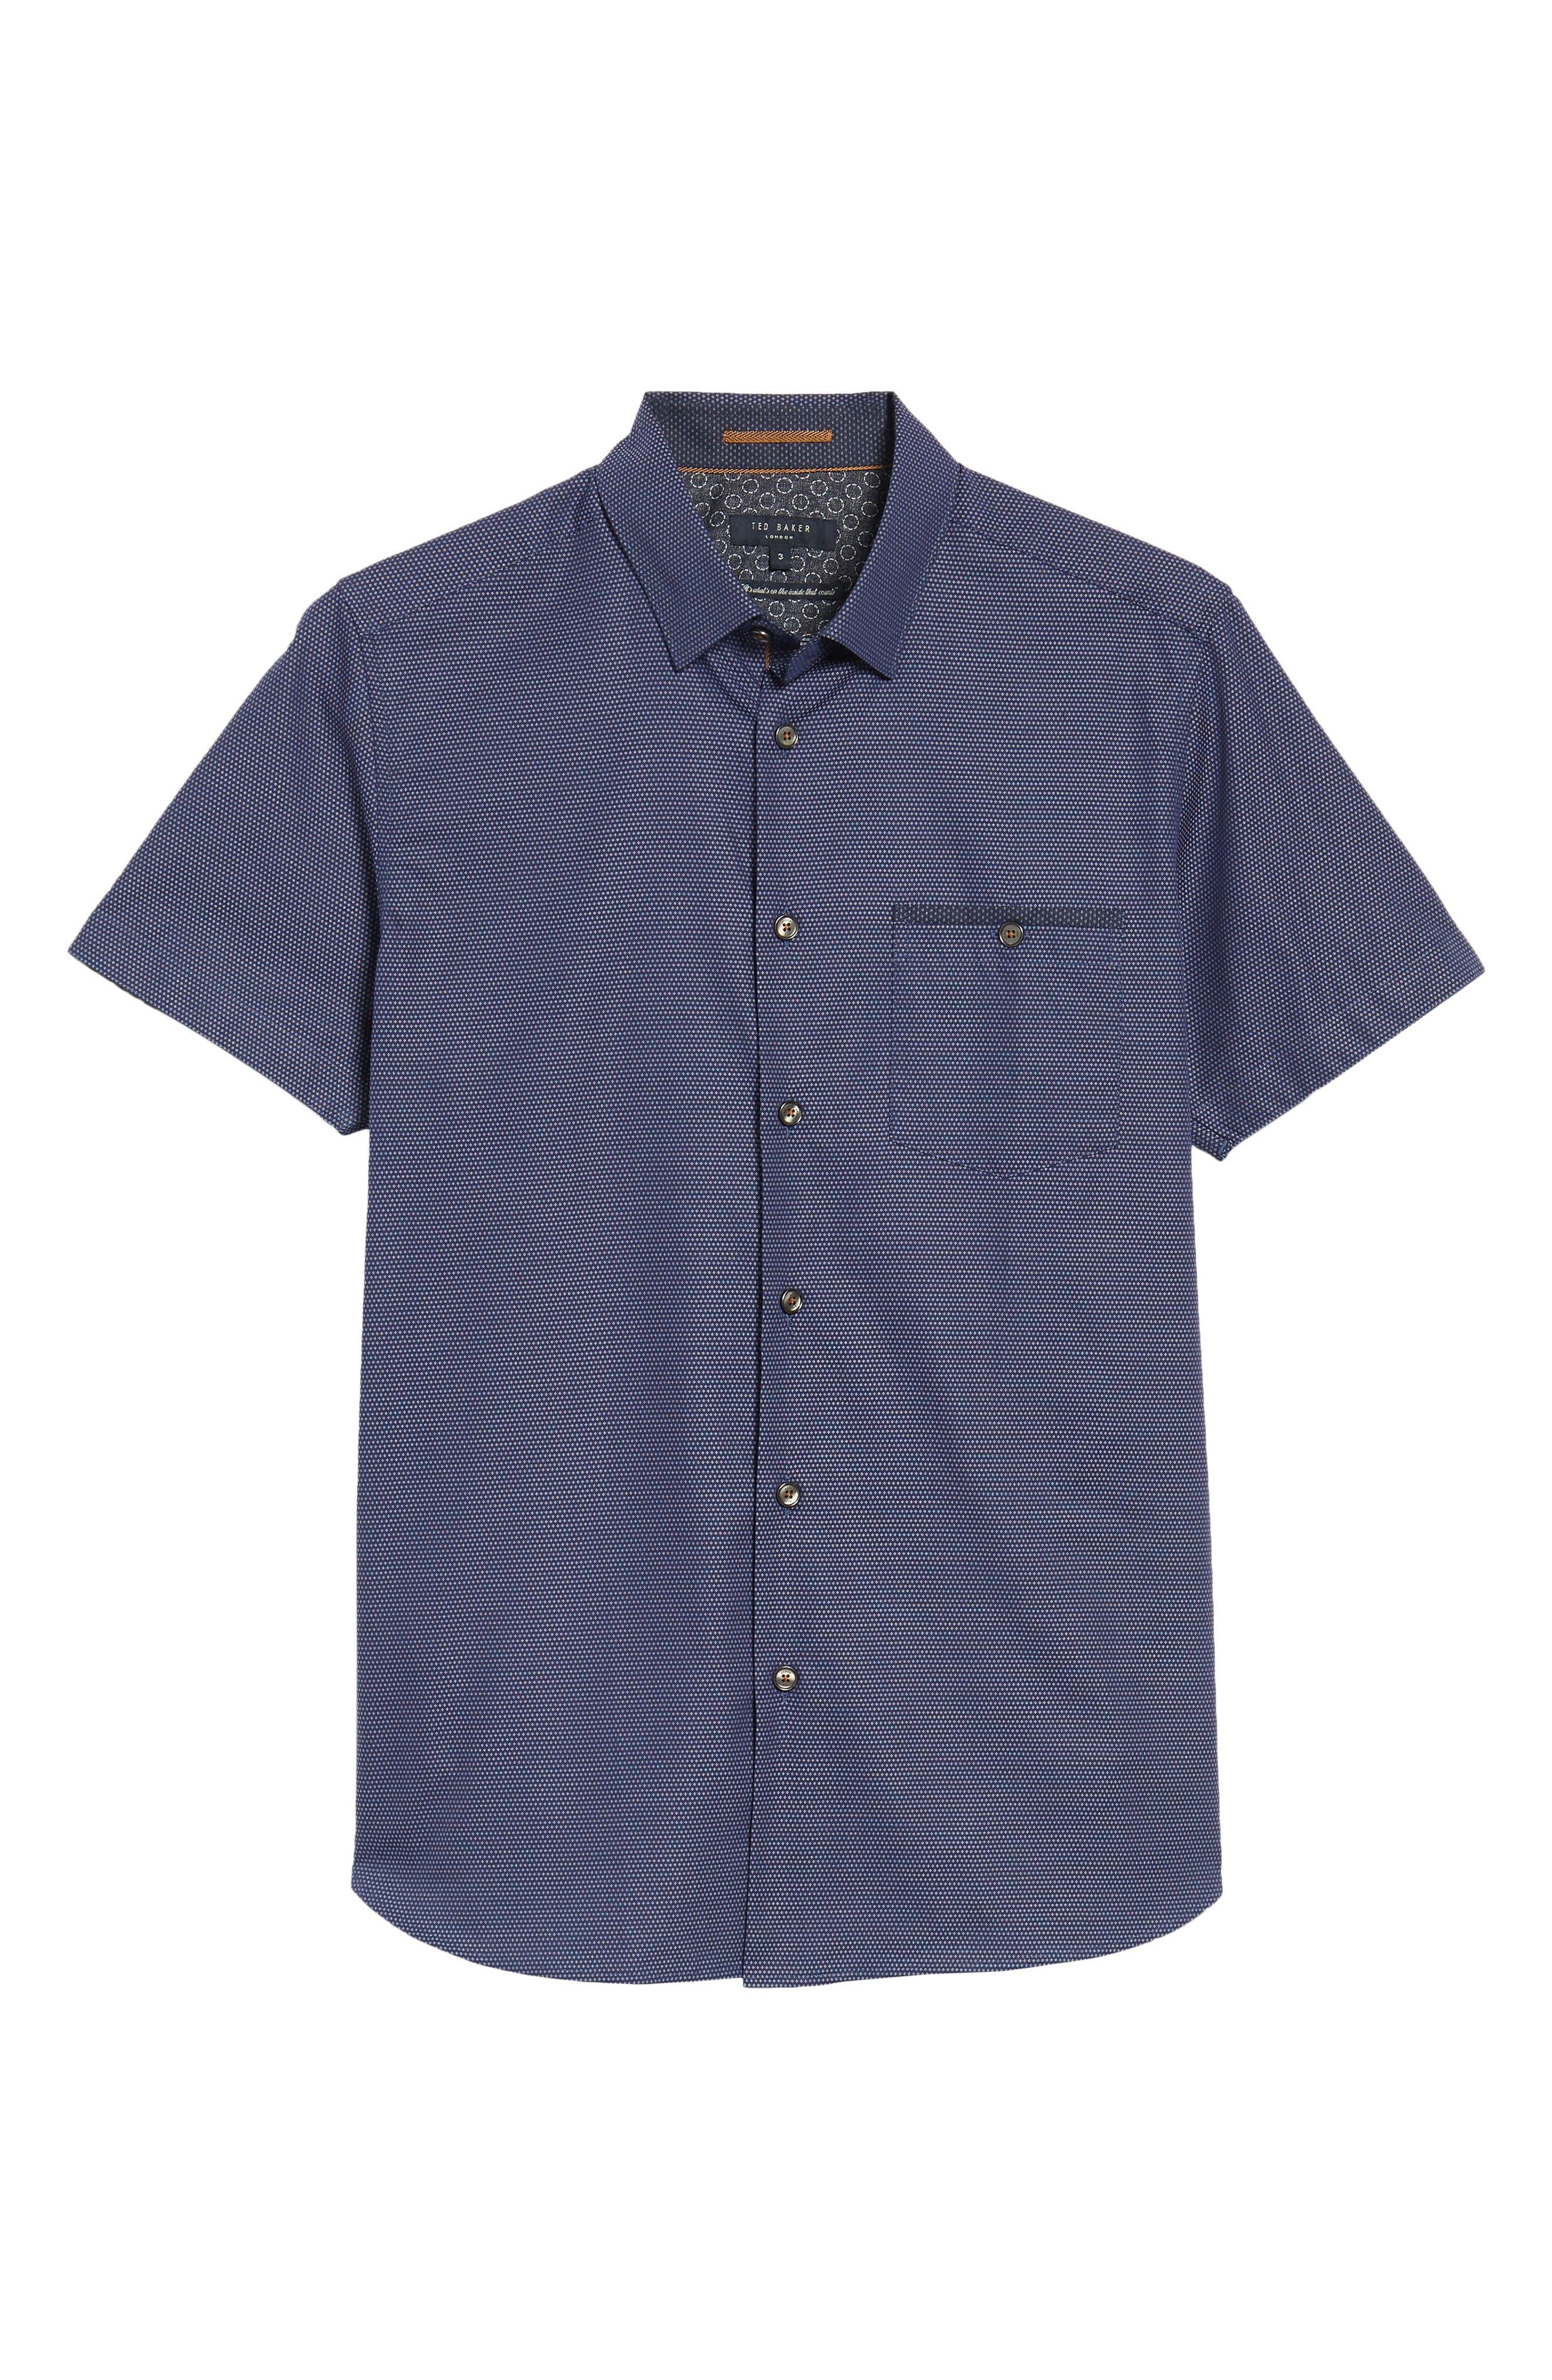 Dotdots Trim Fit Dot Short Sleeve Sport Shirt,                             Alternate thumbnail 6, color,                             Navy